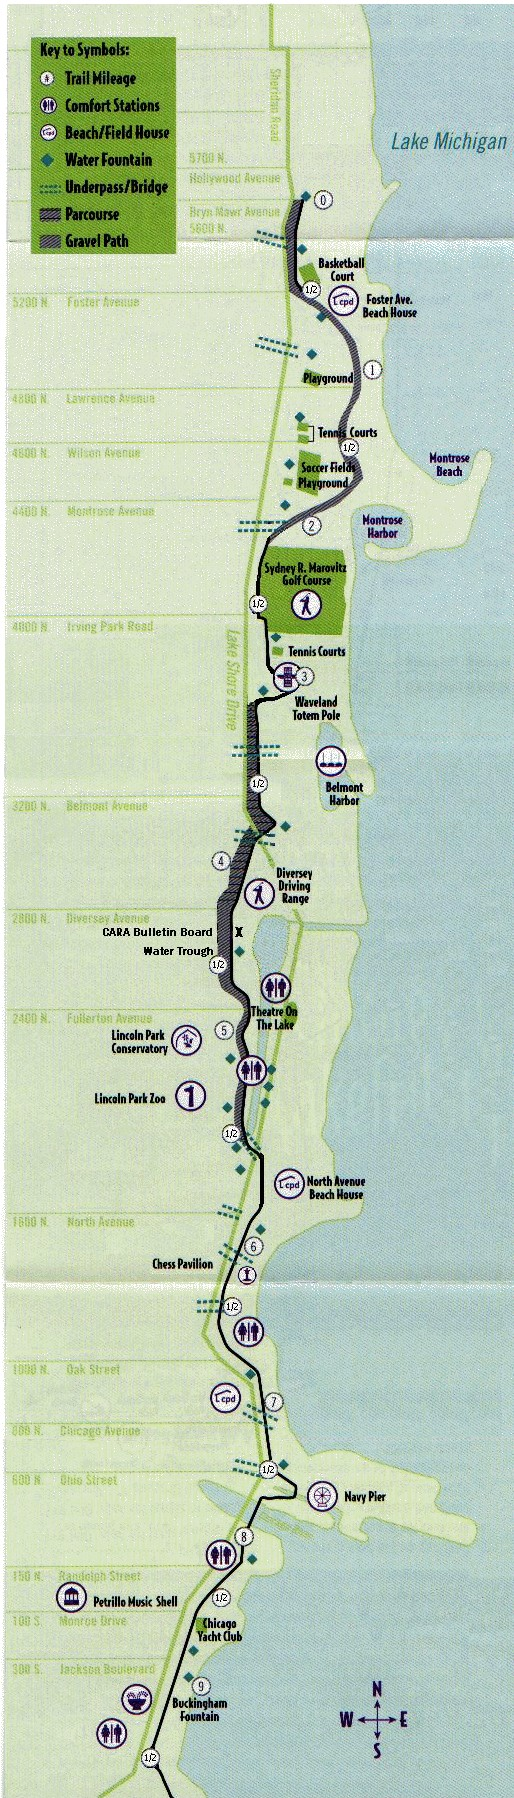 Illinois Bike Paths and Maps